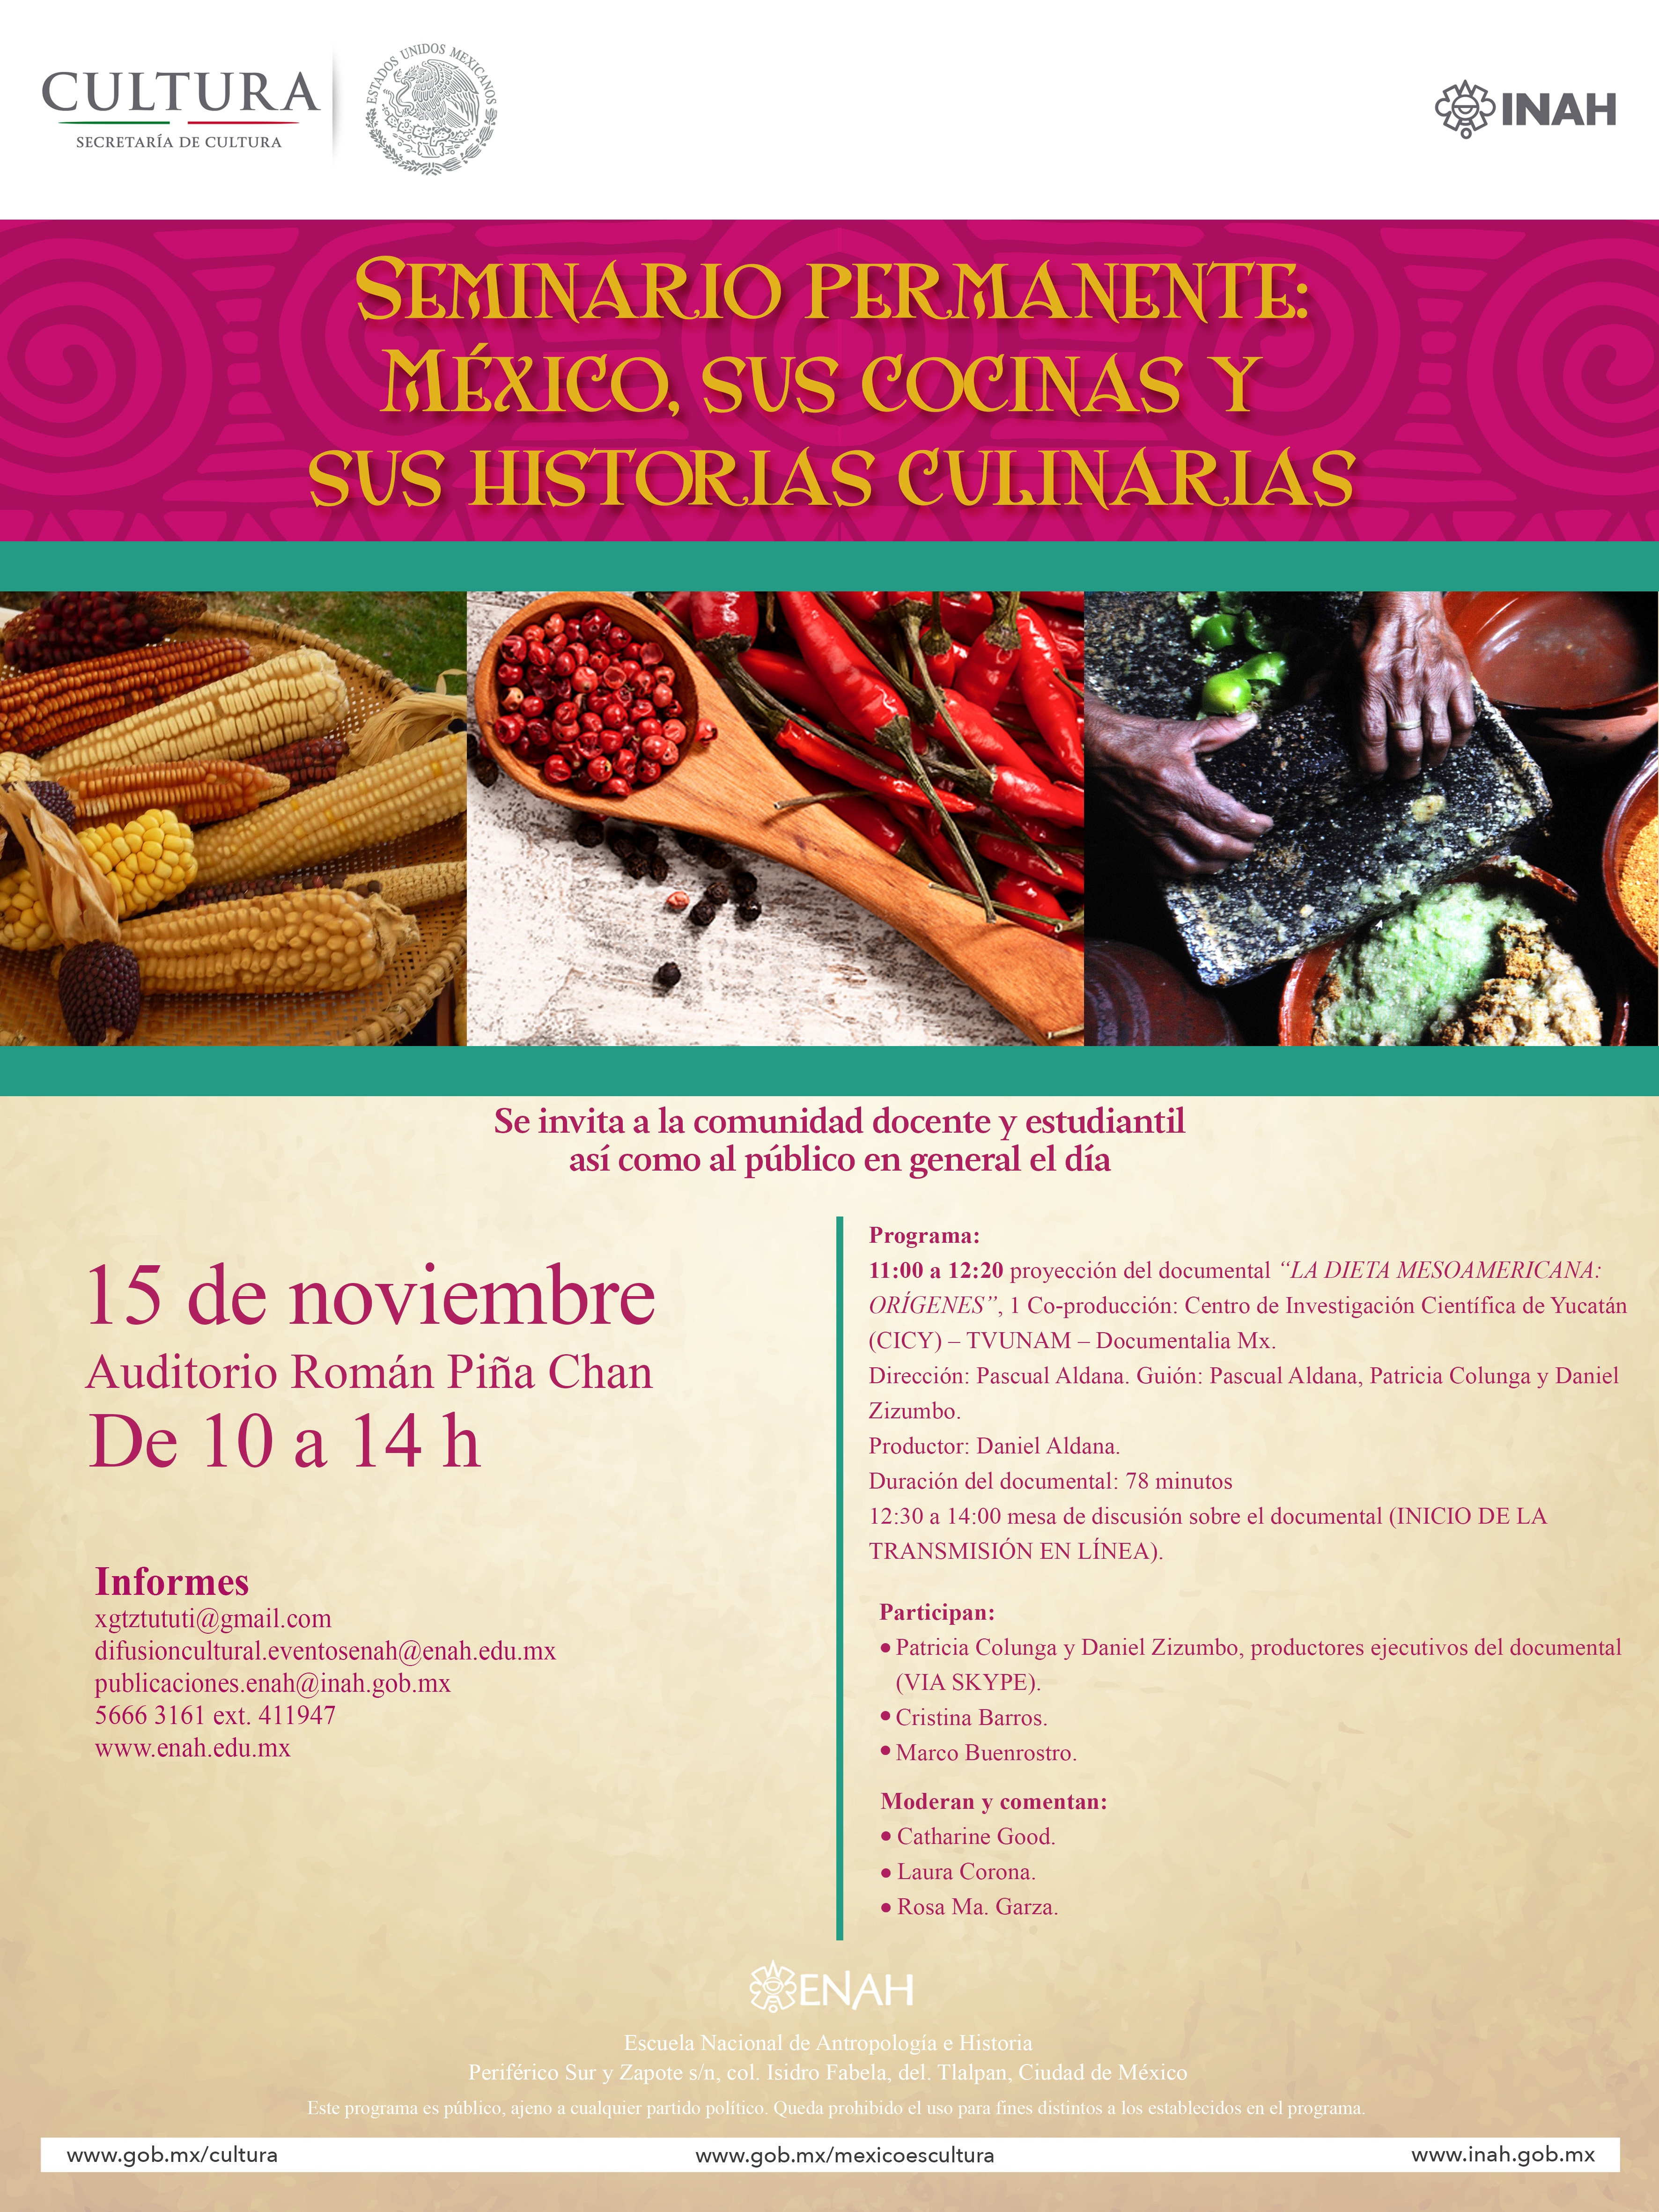 Sesión noviembre seminario cocina y cultura mexicana prehispanica